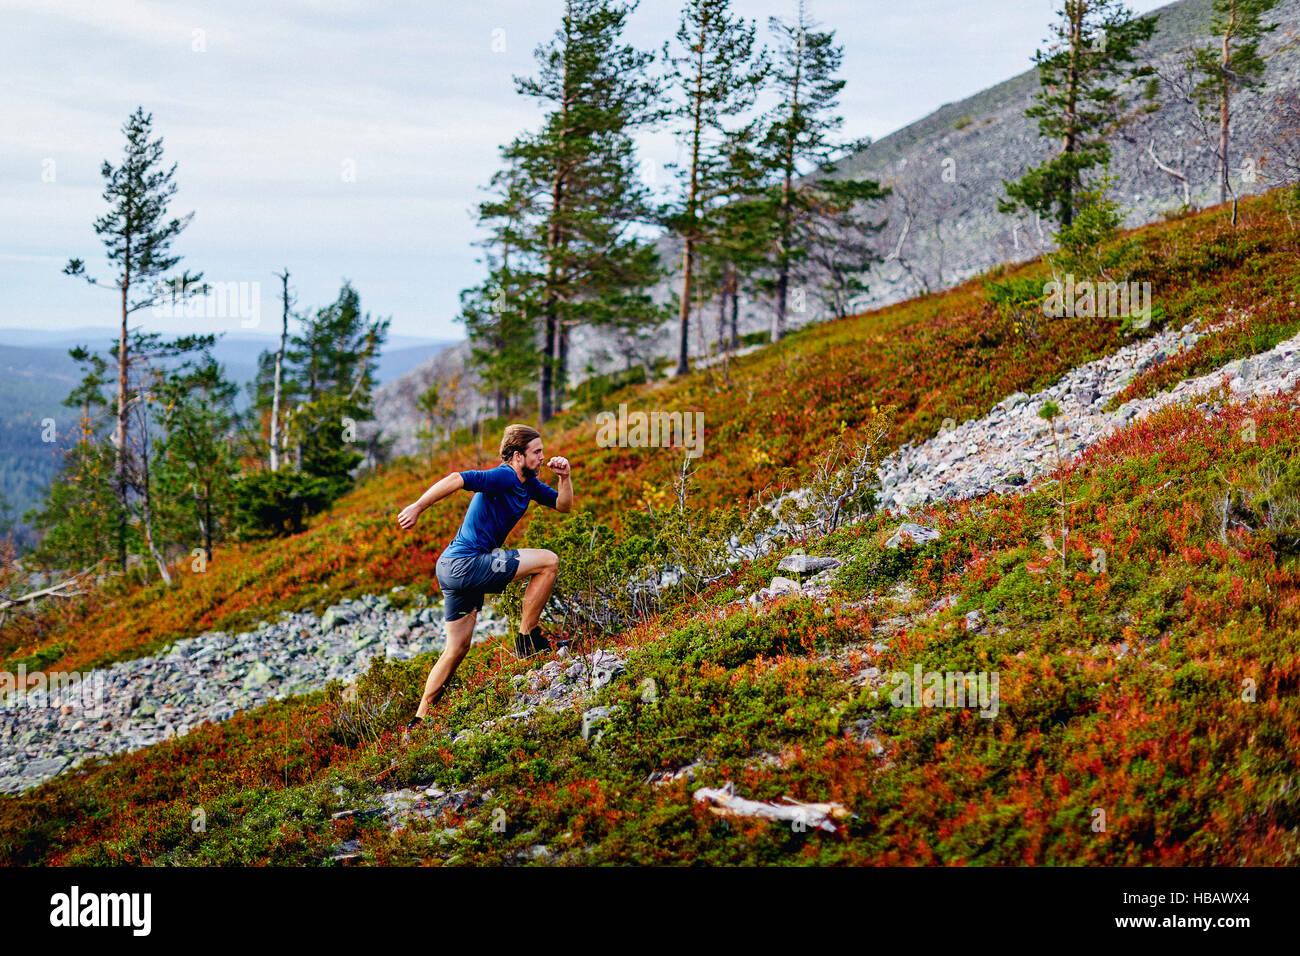 Man running up steep hill, Kesankitunturi, Lapland, Finland - Stock Image